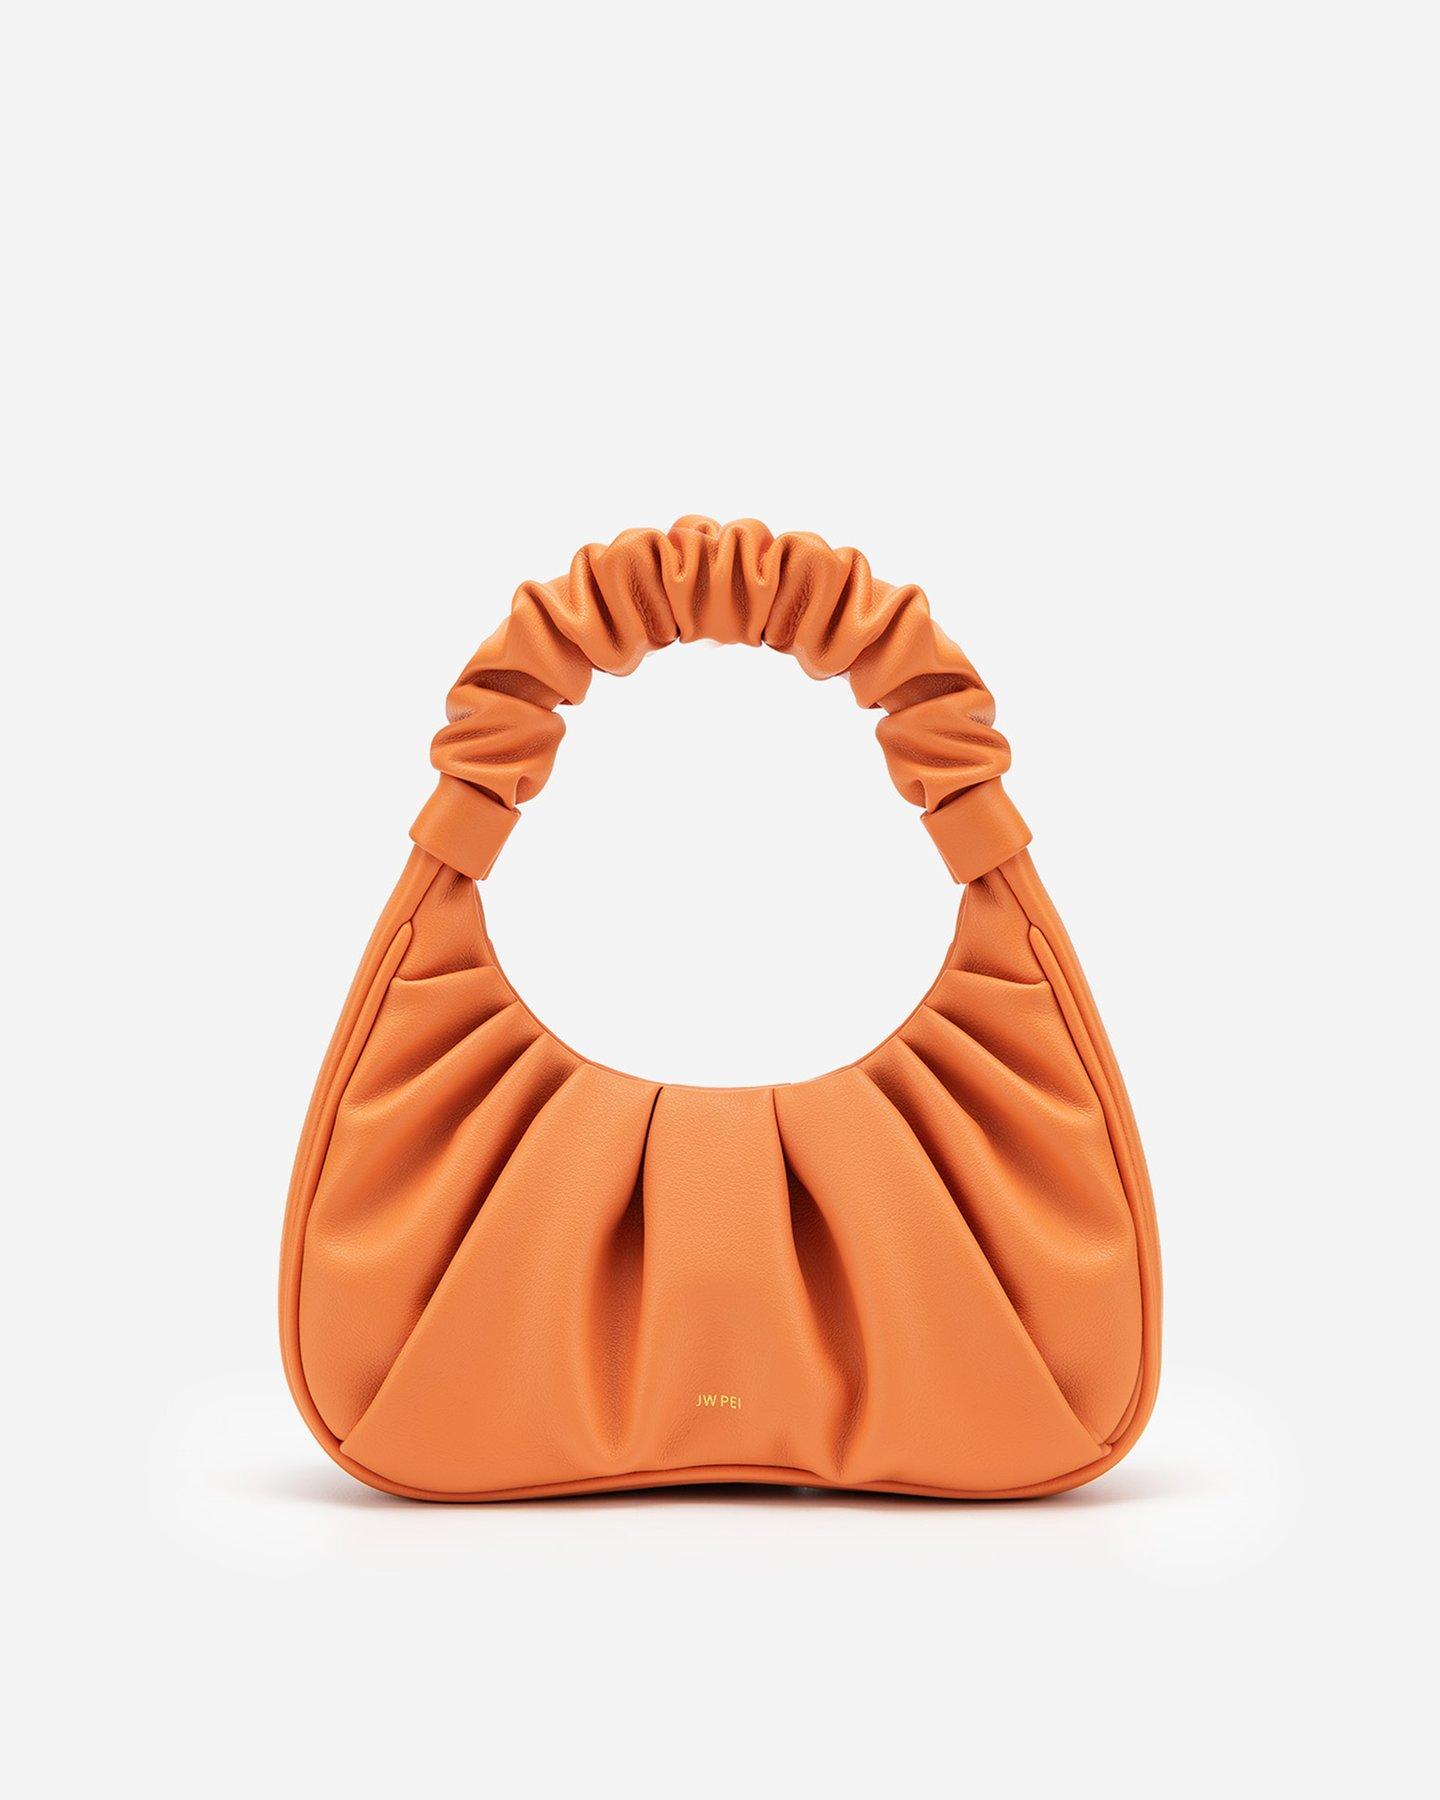 Gabbi Bag - Orange by JW PEI, available on jwpei.com for $72 Emily Ratajkowski Bags Exact Product